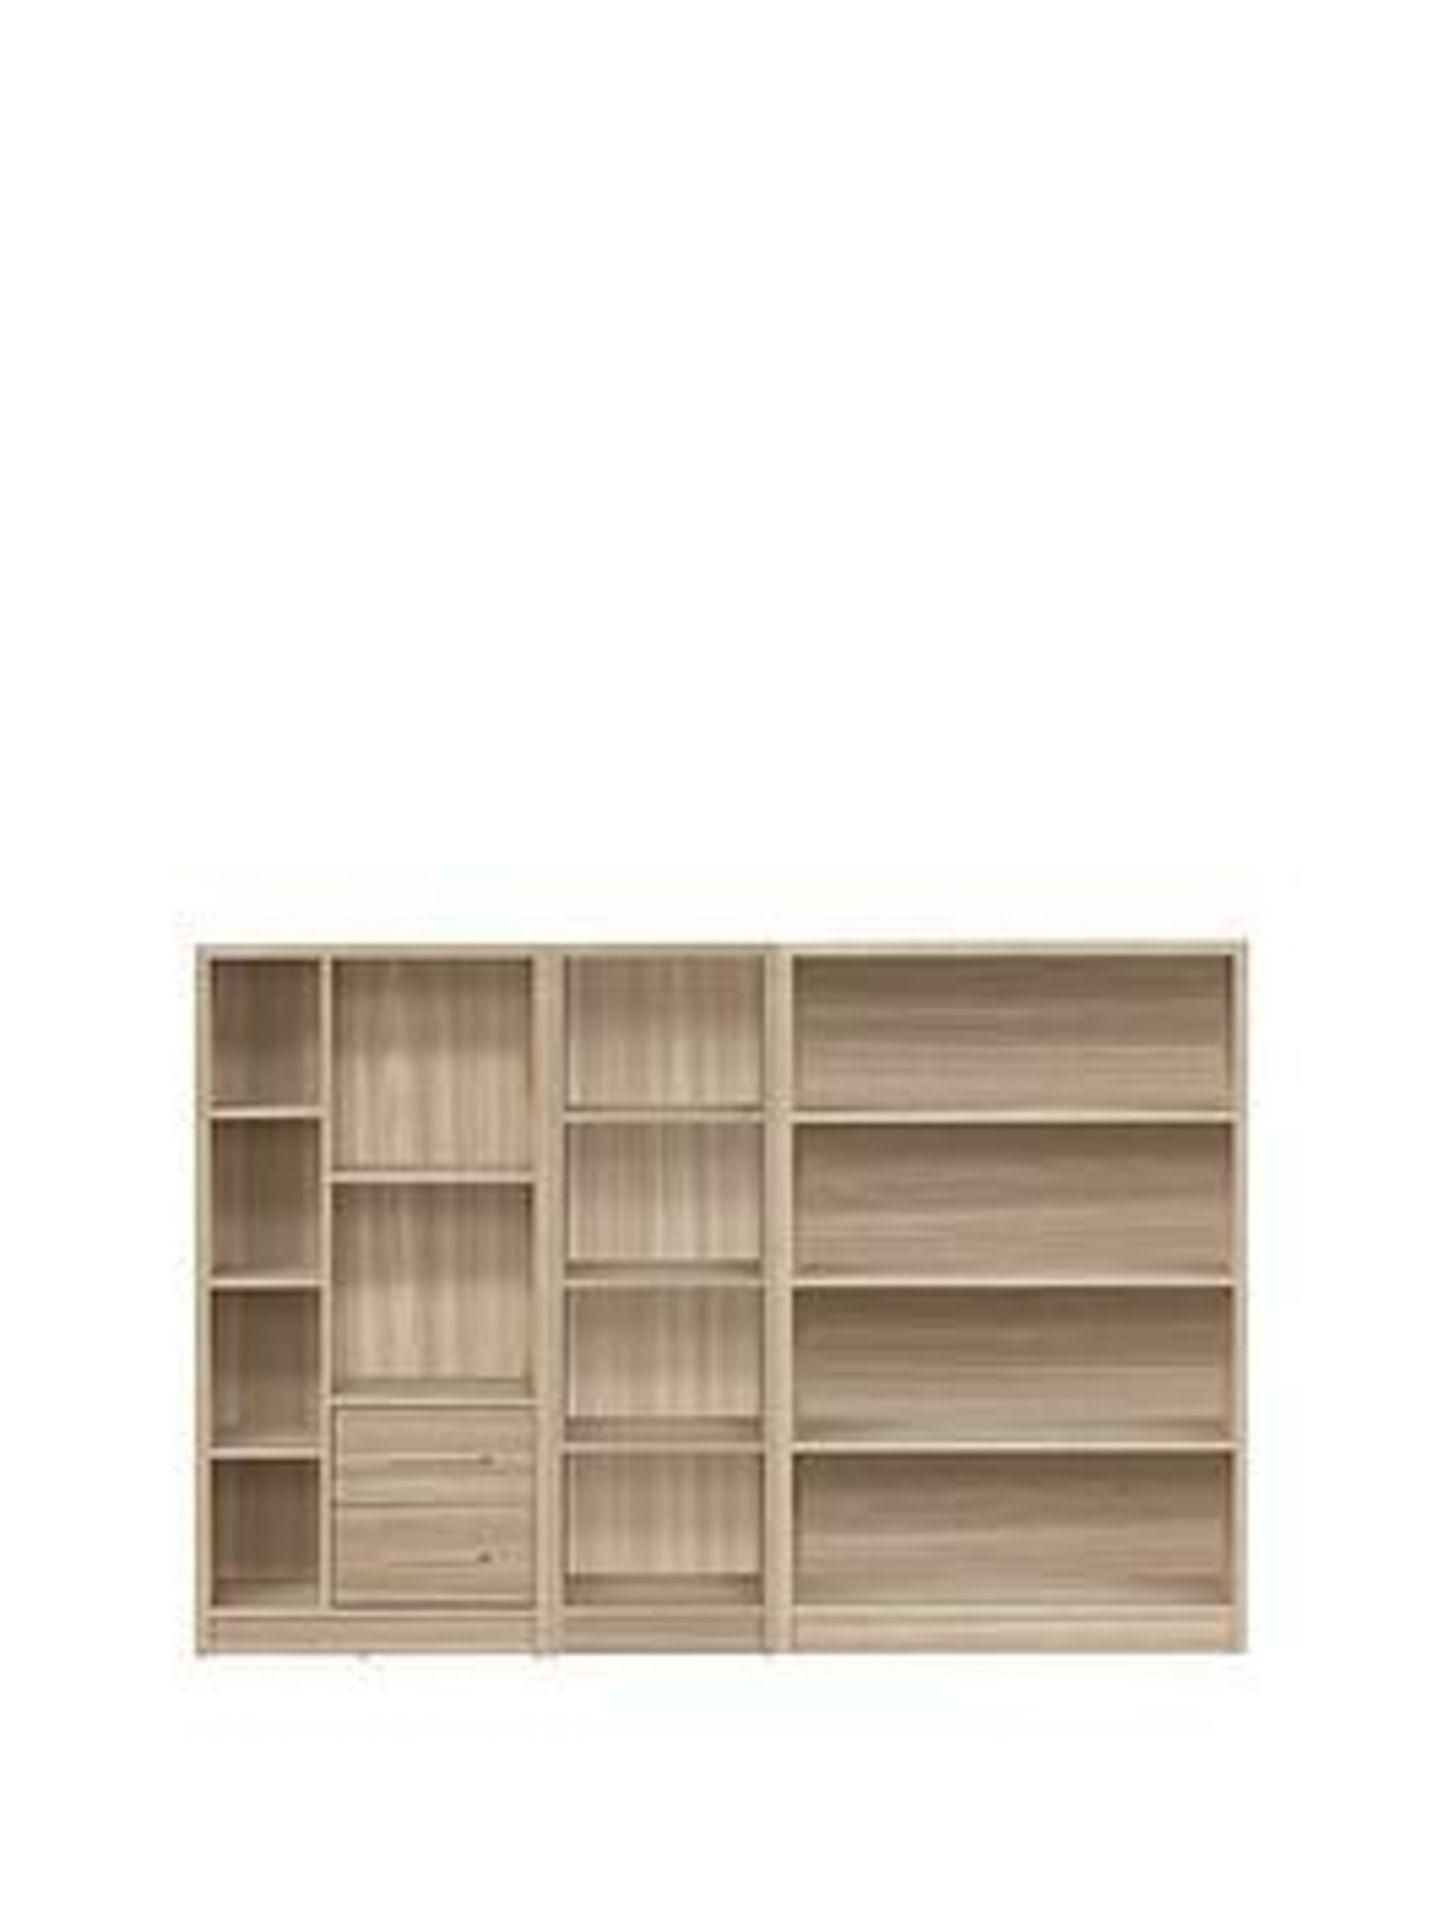 Lot 51 - Boxed Item Metro 3 Piece Bookcase [Oak] 121X79X30Cm rrp, £226.0